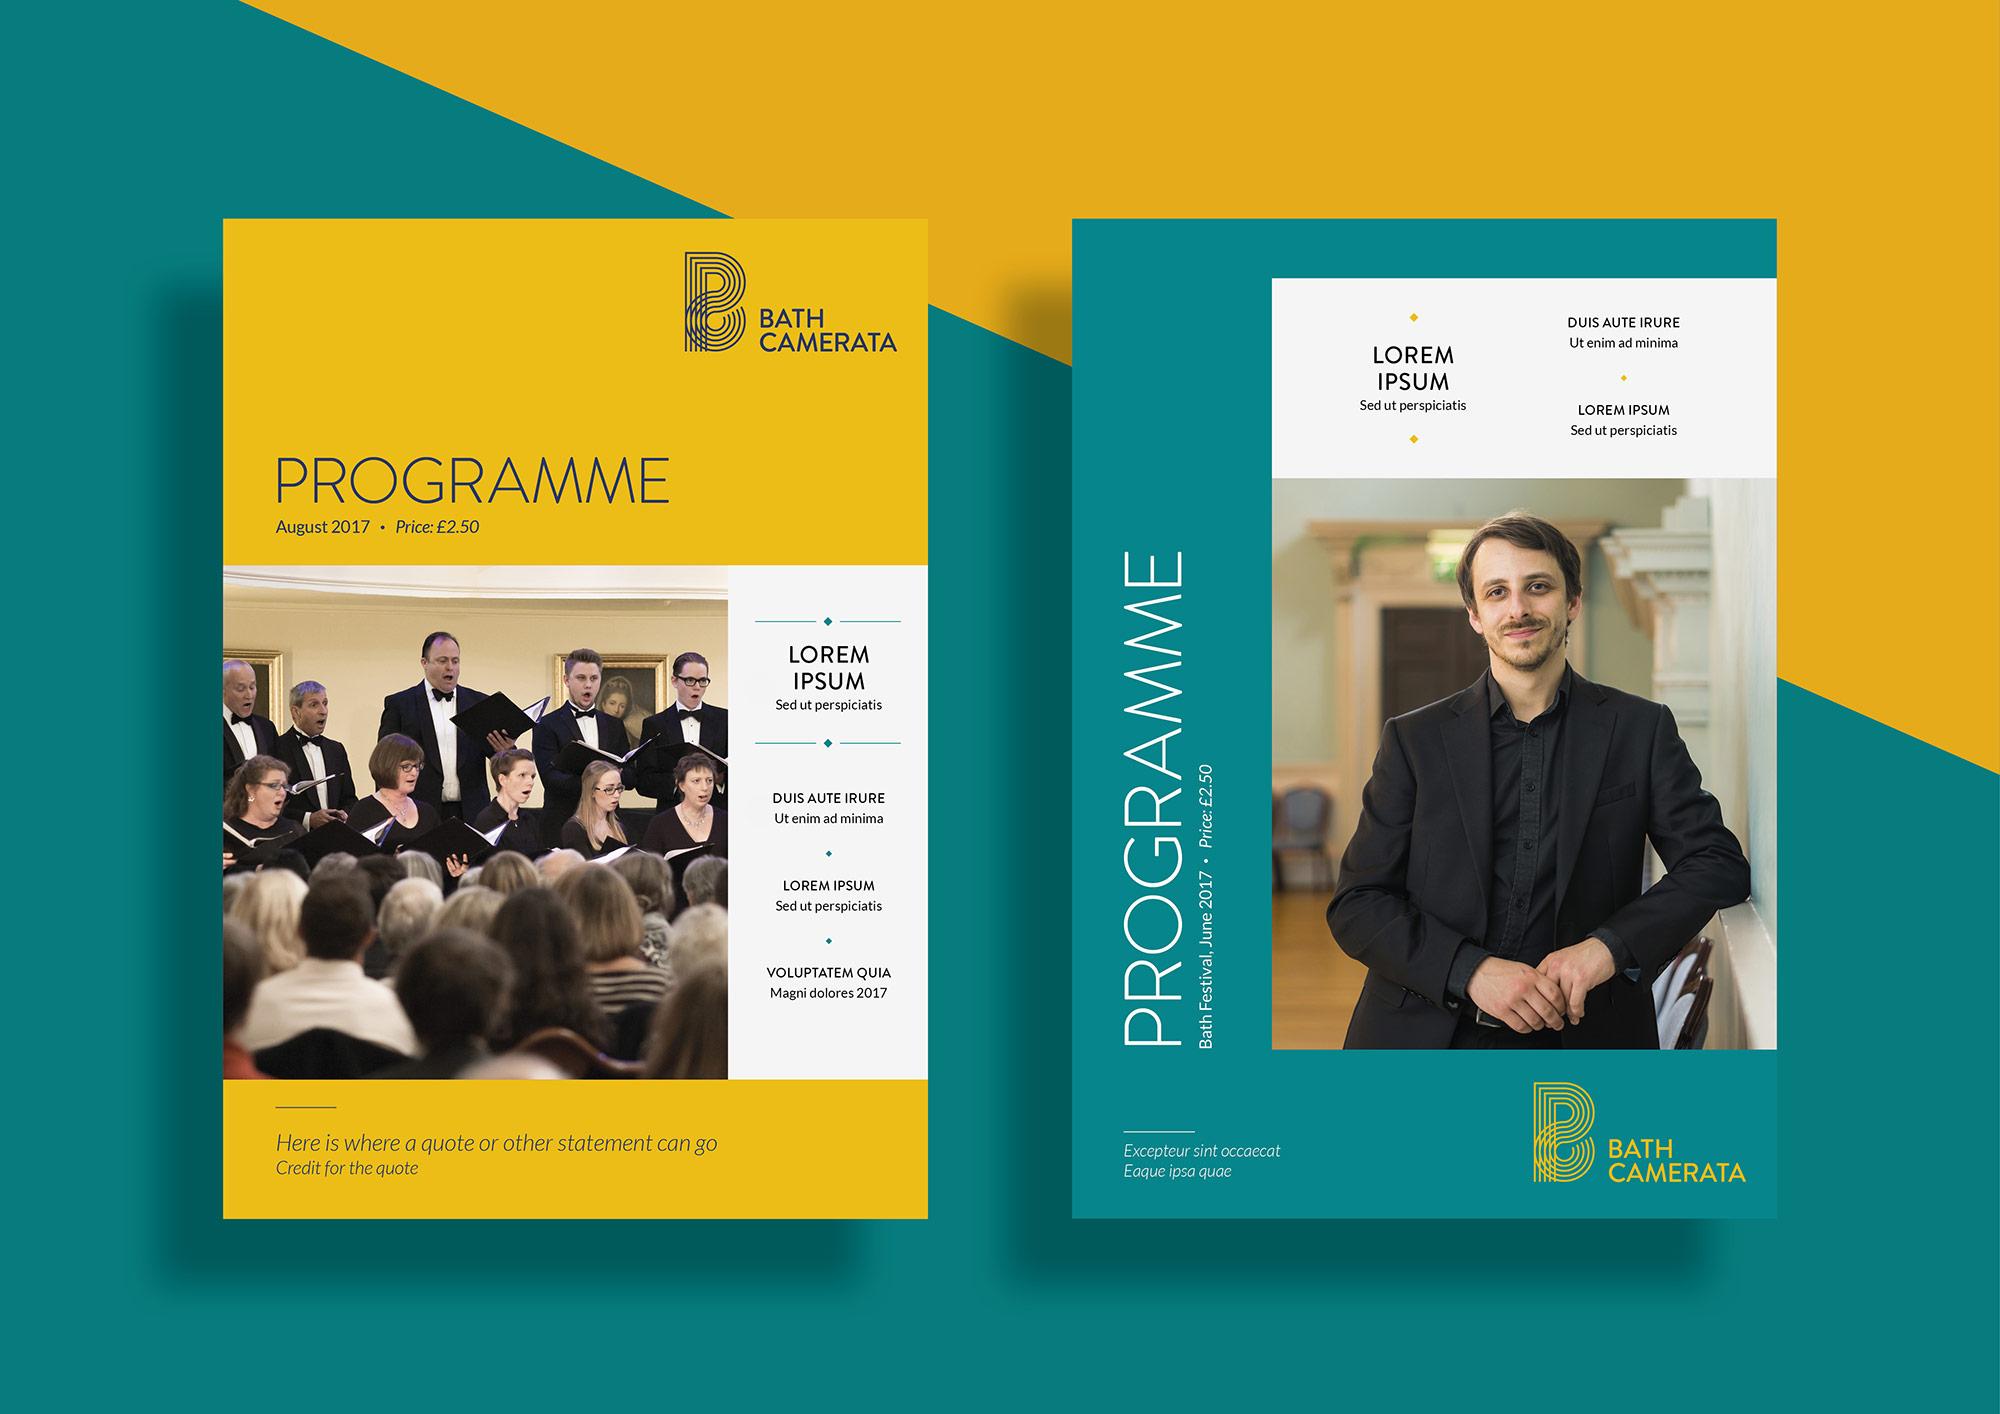 Bath Camerata programme covers